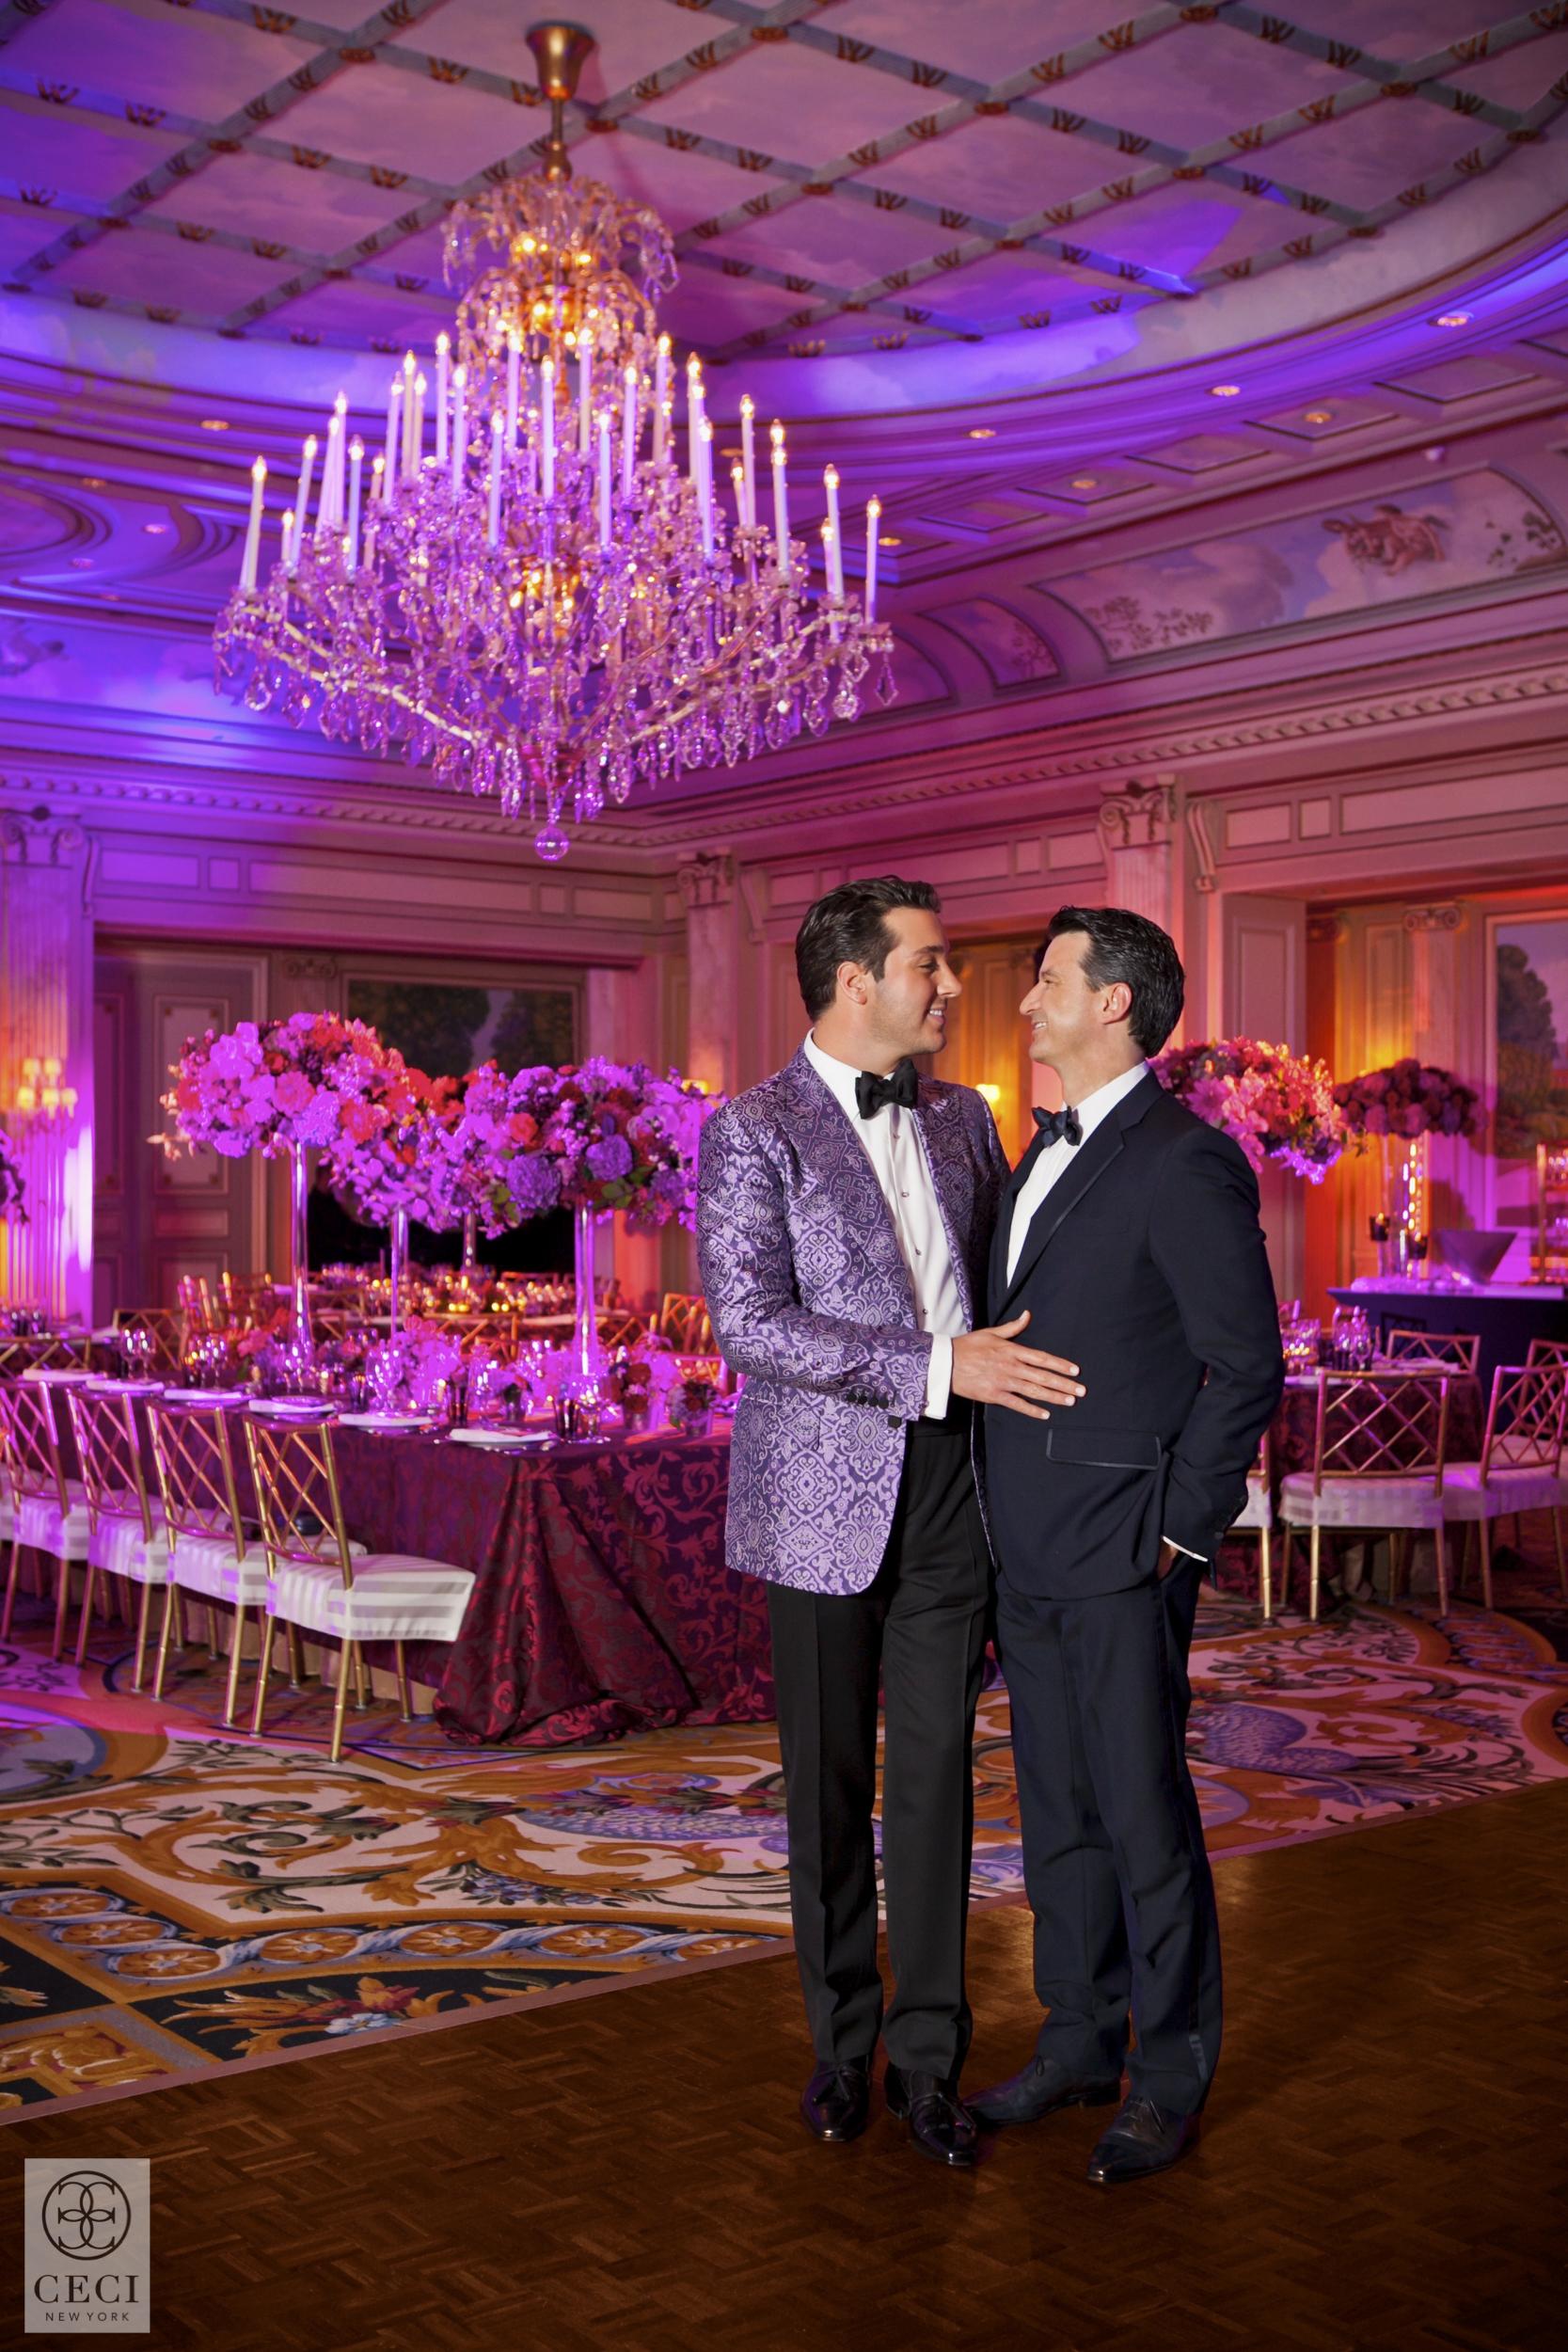 ceci_new_york_lucas_somoza_purple_regal_wediding_birthday_commitment_ceremony_gold-17.jpg